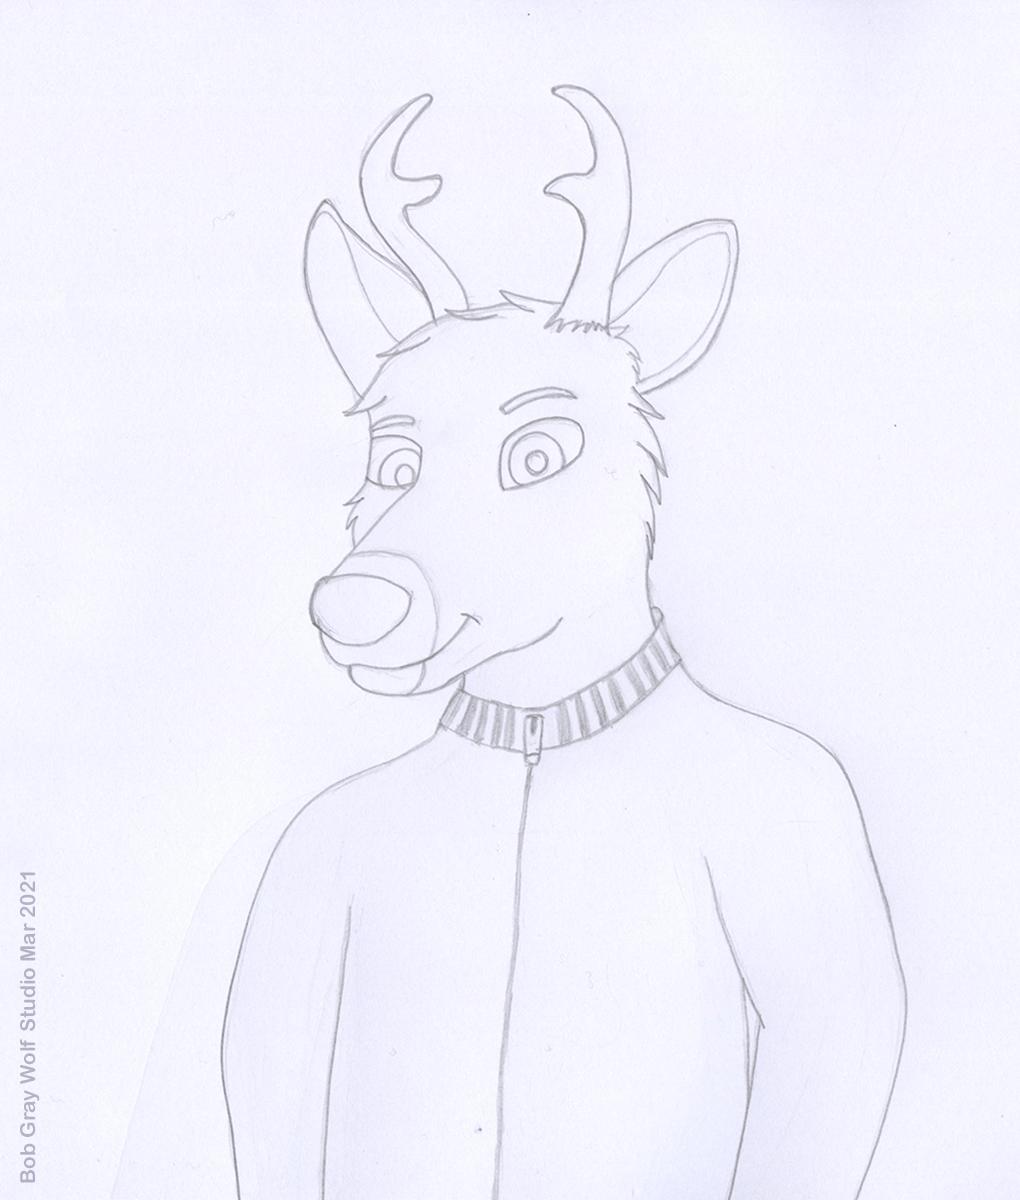 Most recent image: Keldan Deer - Sketch